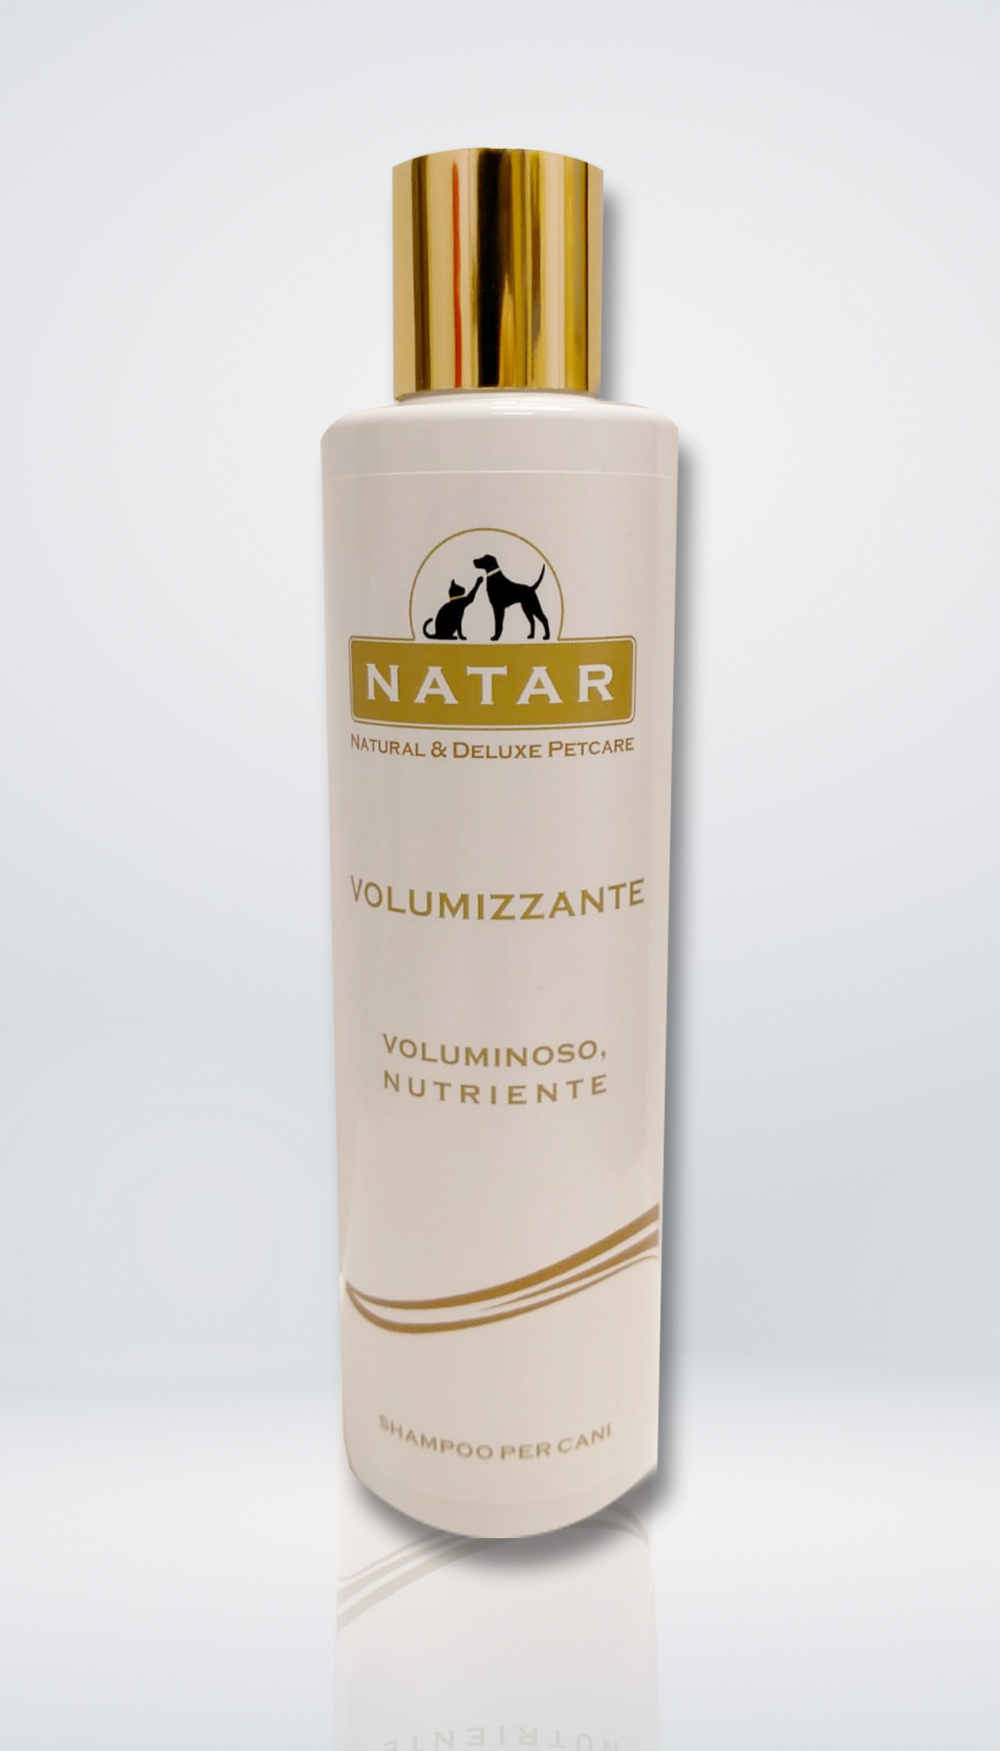 Natar Volumizing shampoo for dogs